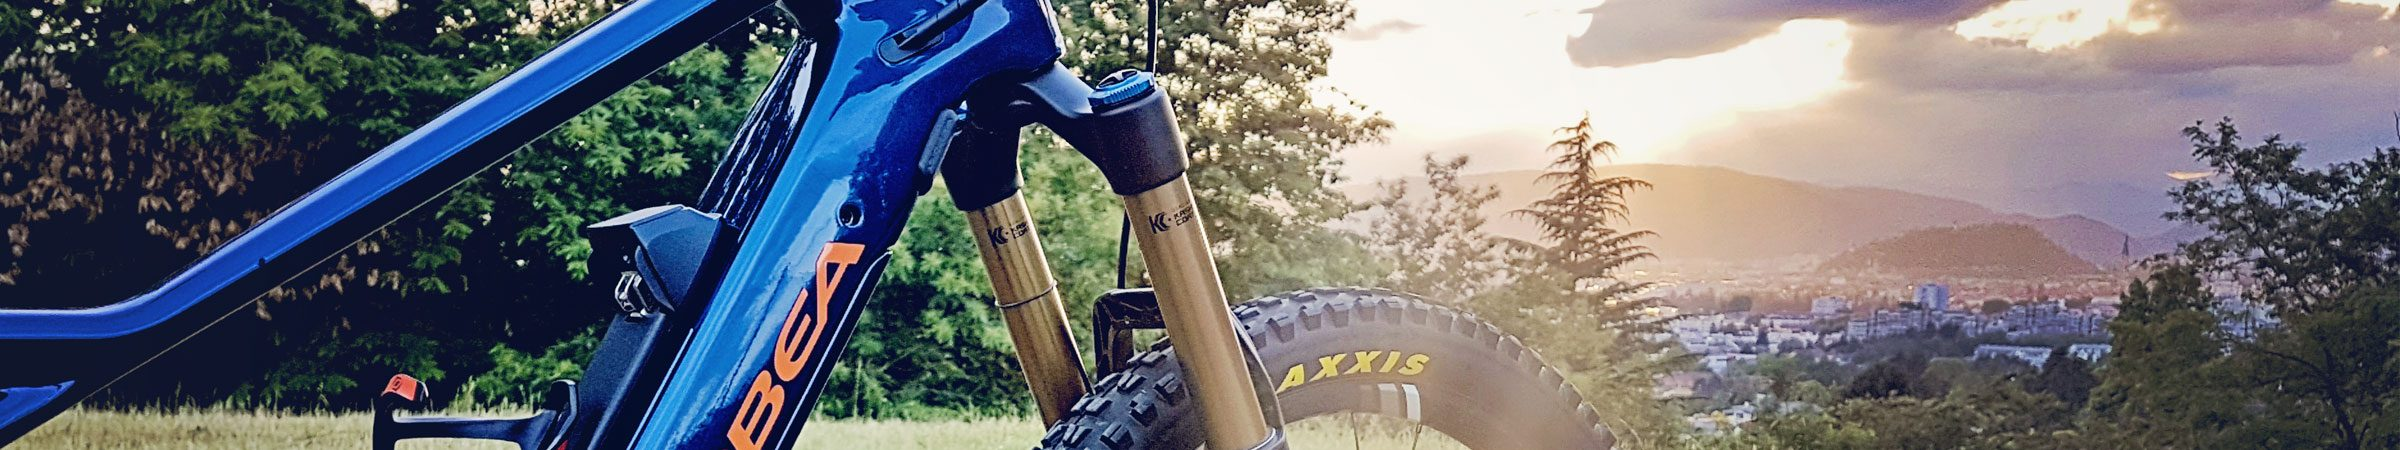 bike-header-3